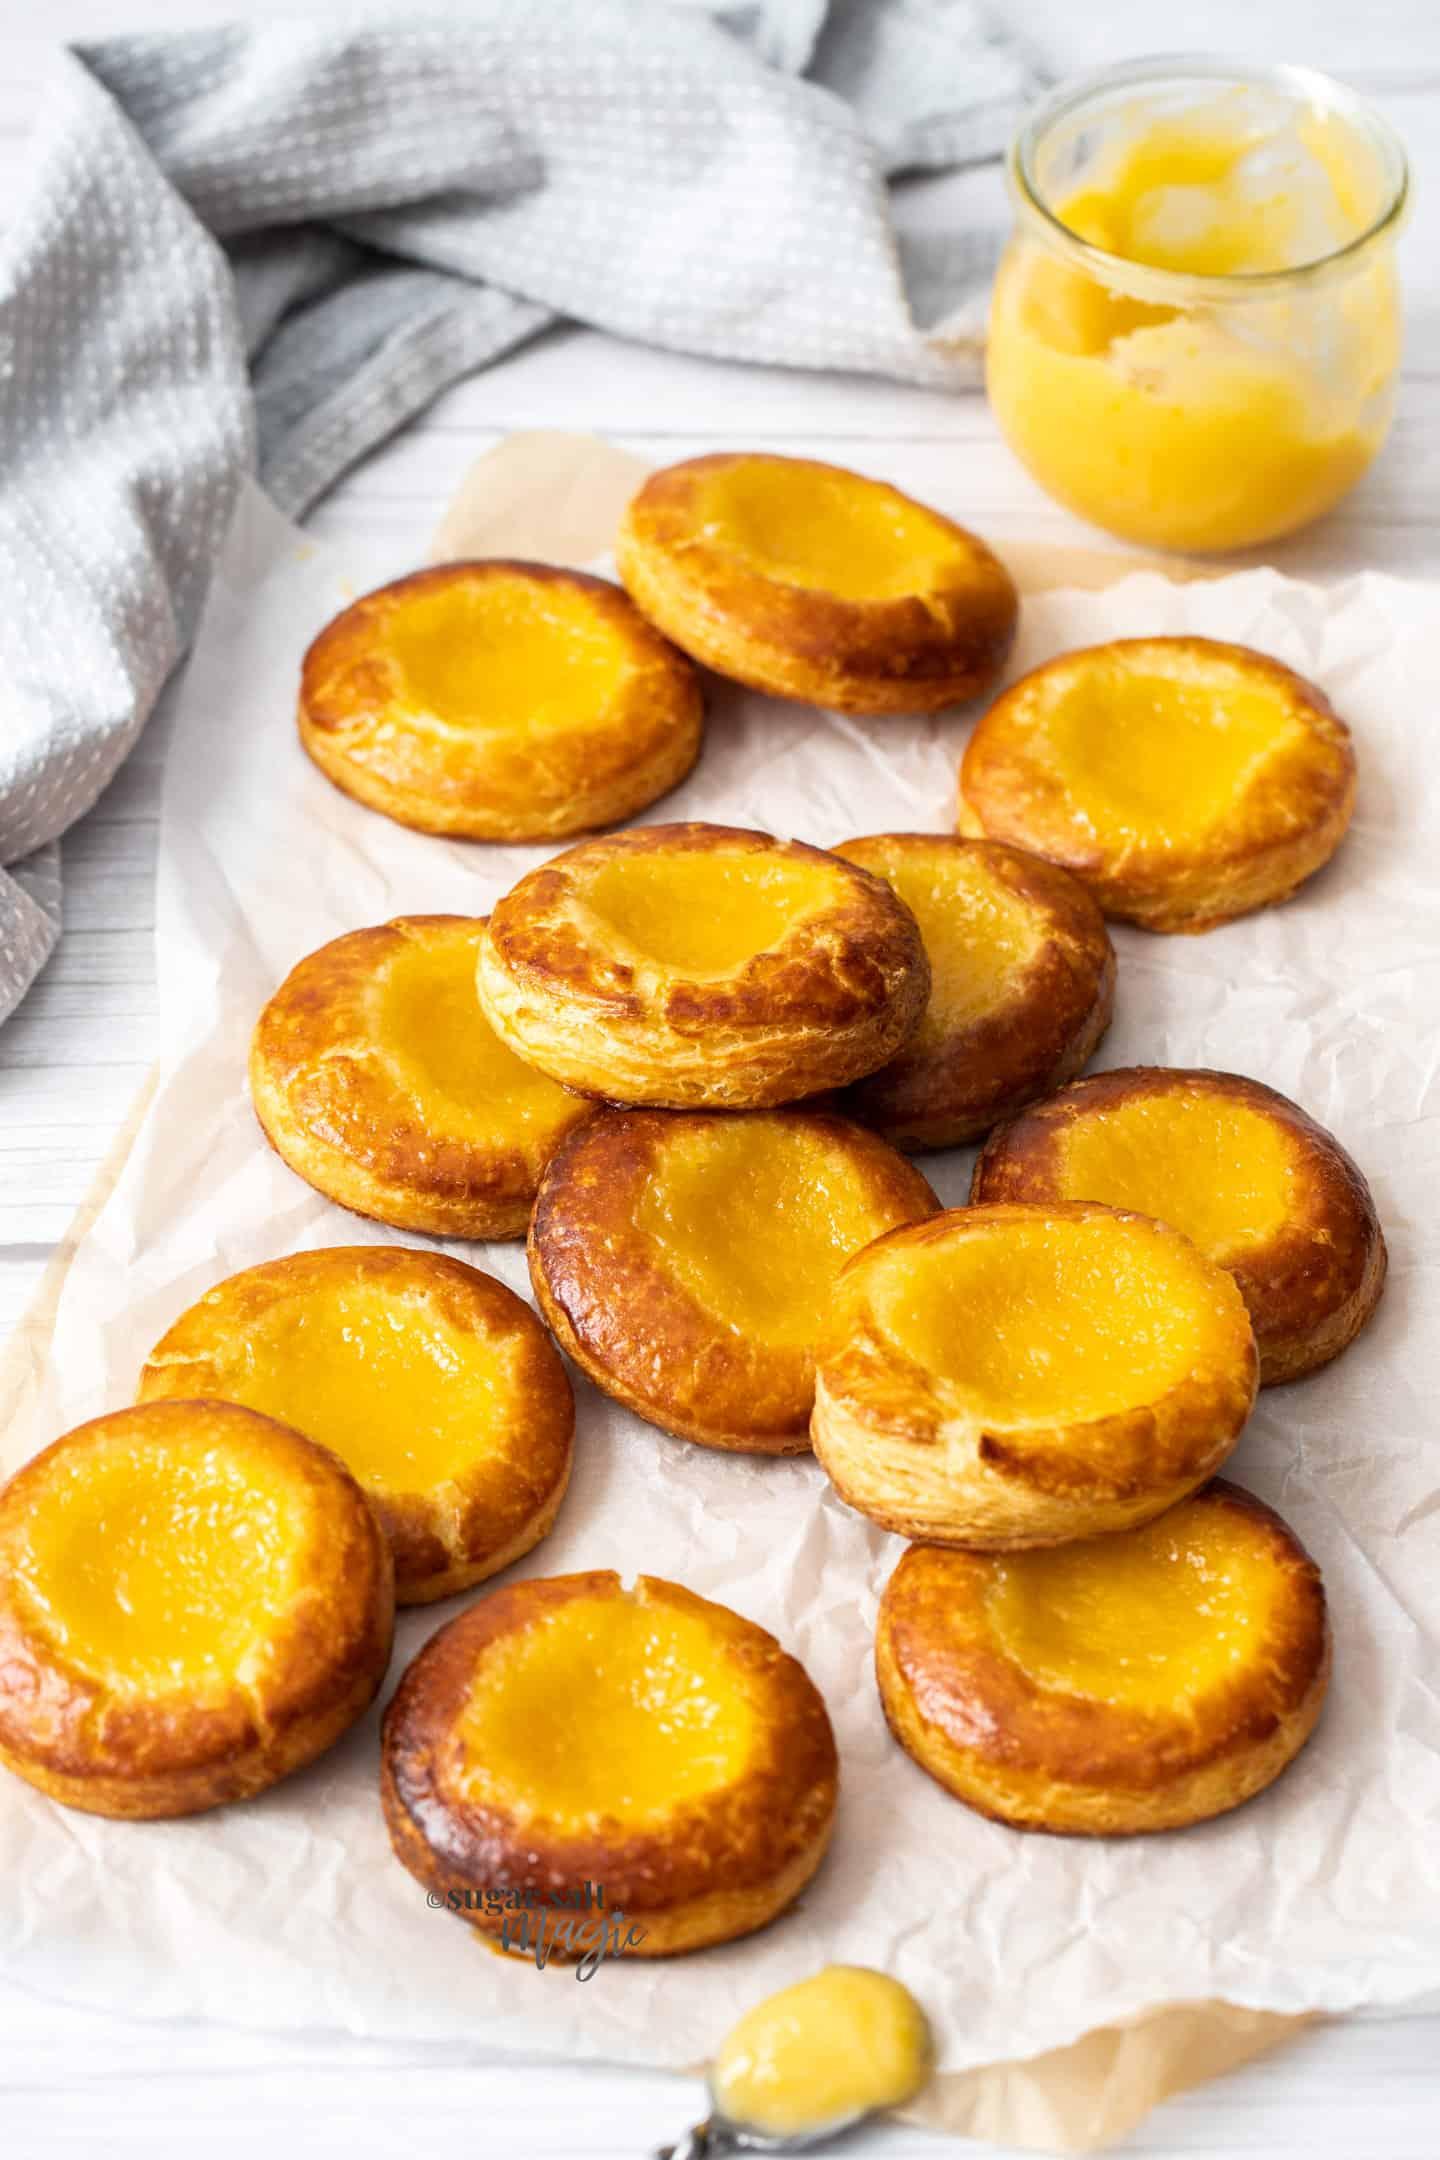 13 lemon danish pastries on a sheet of baking paper.